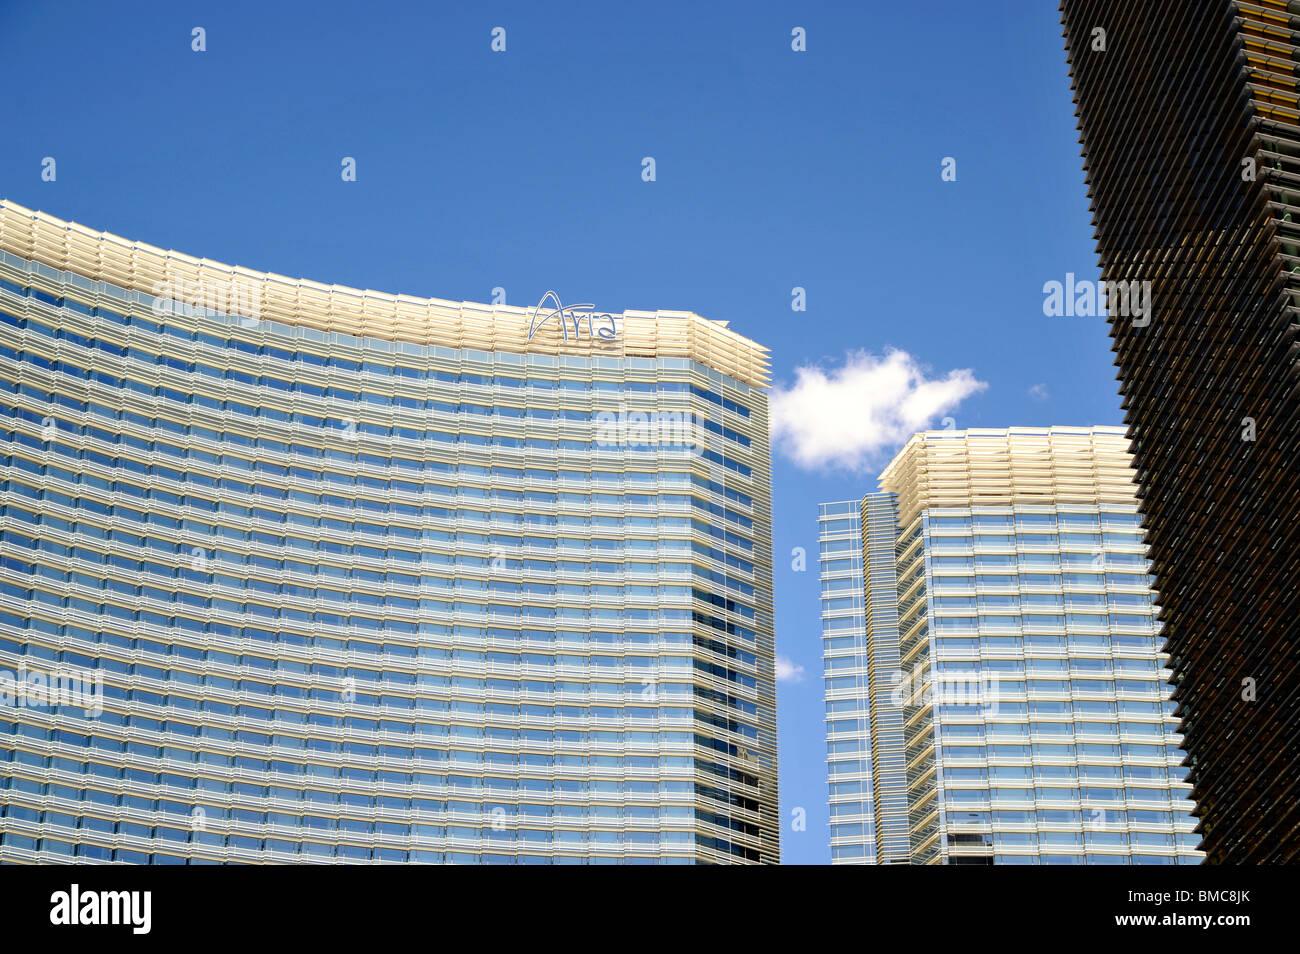 Citycenter casino complex игровые автоматы coolfire 2